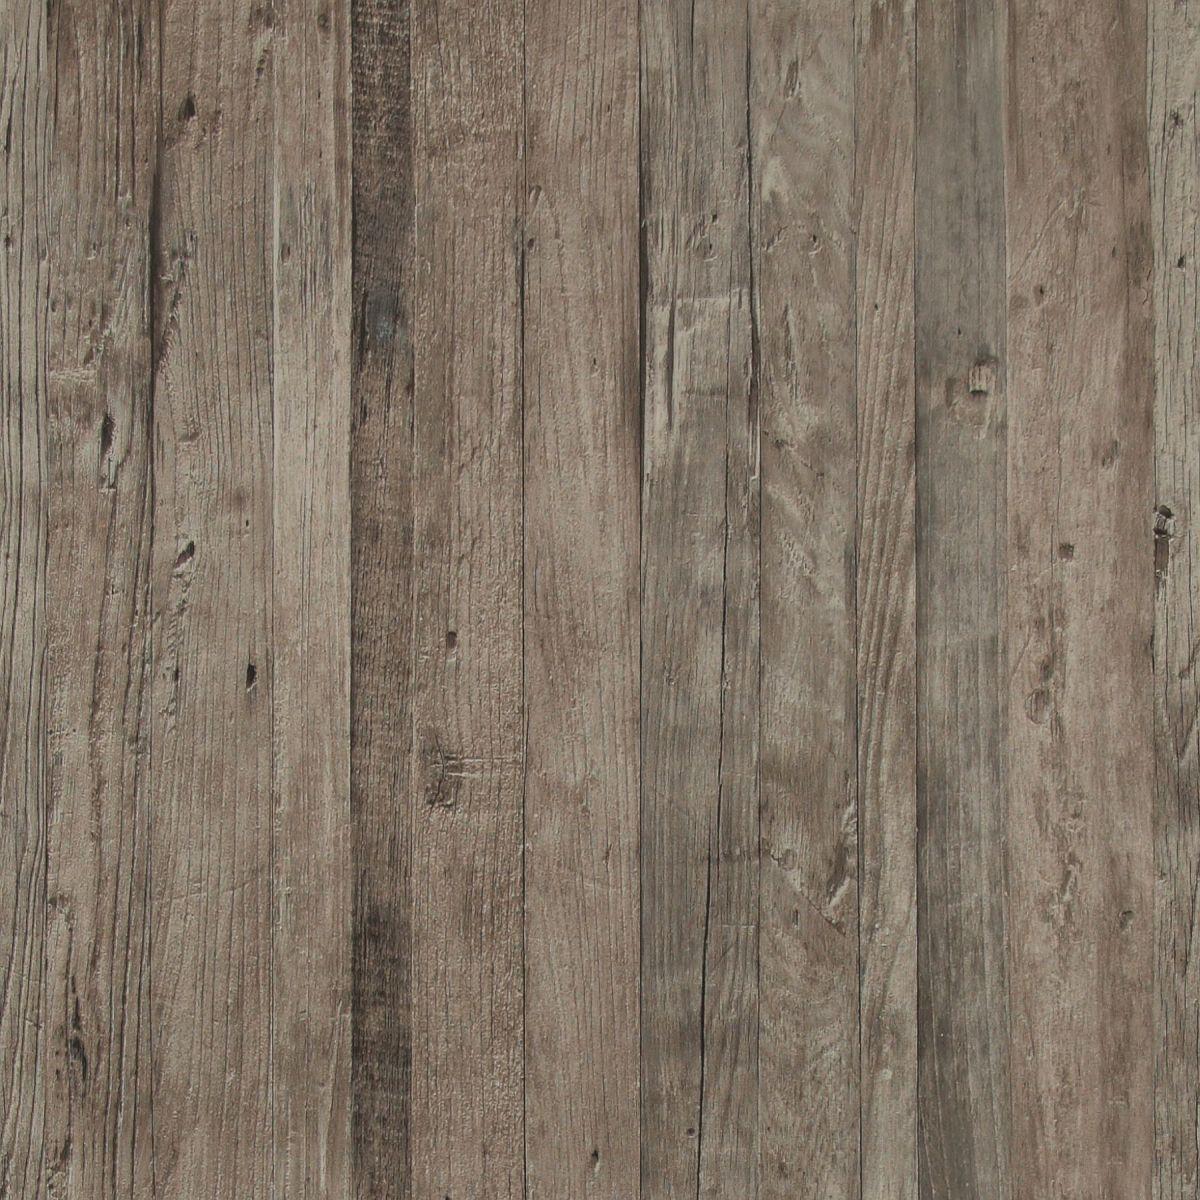 hochwertige tapeten und stoffe b n wallcoverings vliestapete riviera maison 18291 decowunder. Black Bedroom Furniture Sets. Home Design Ideas